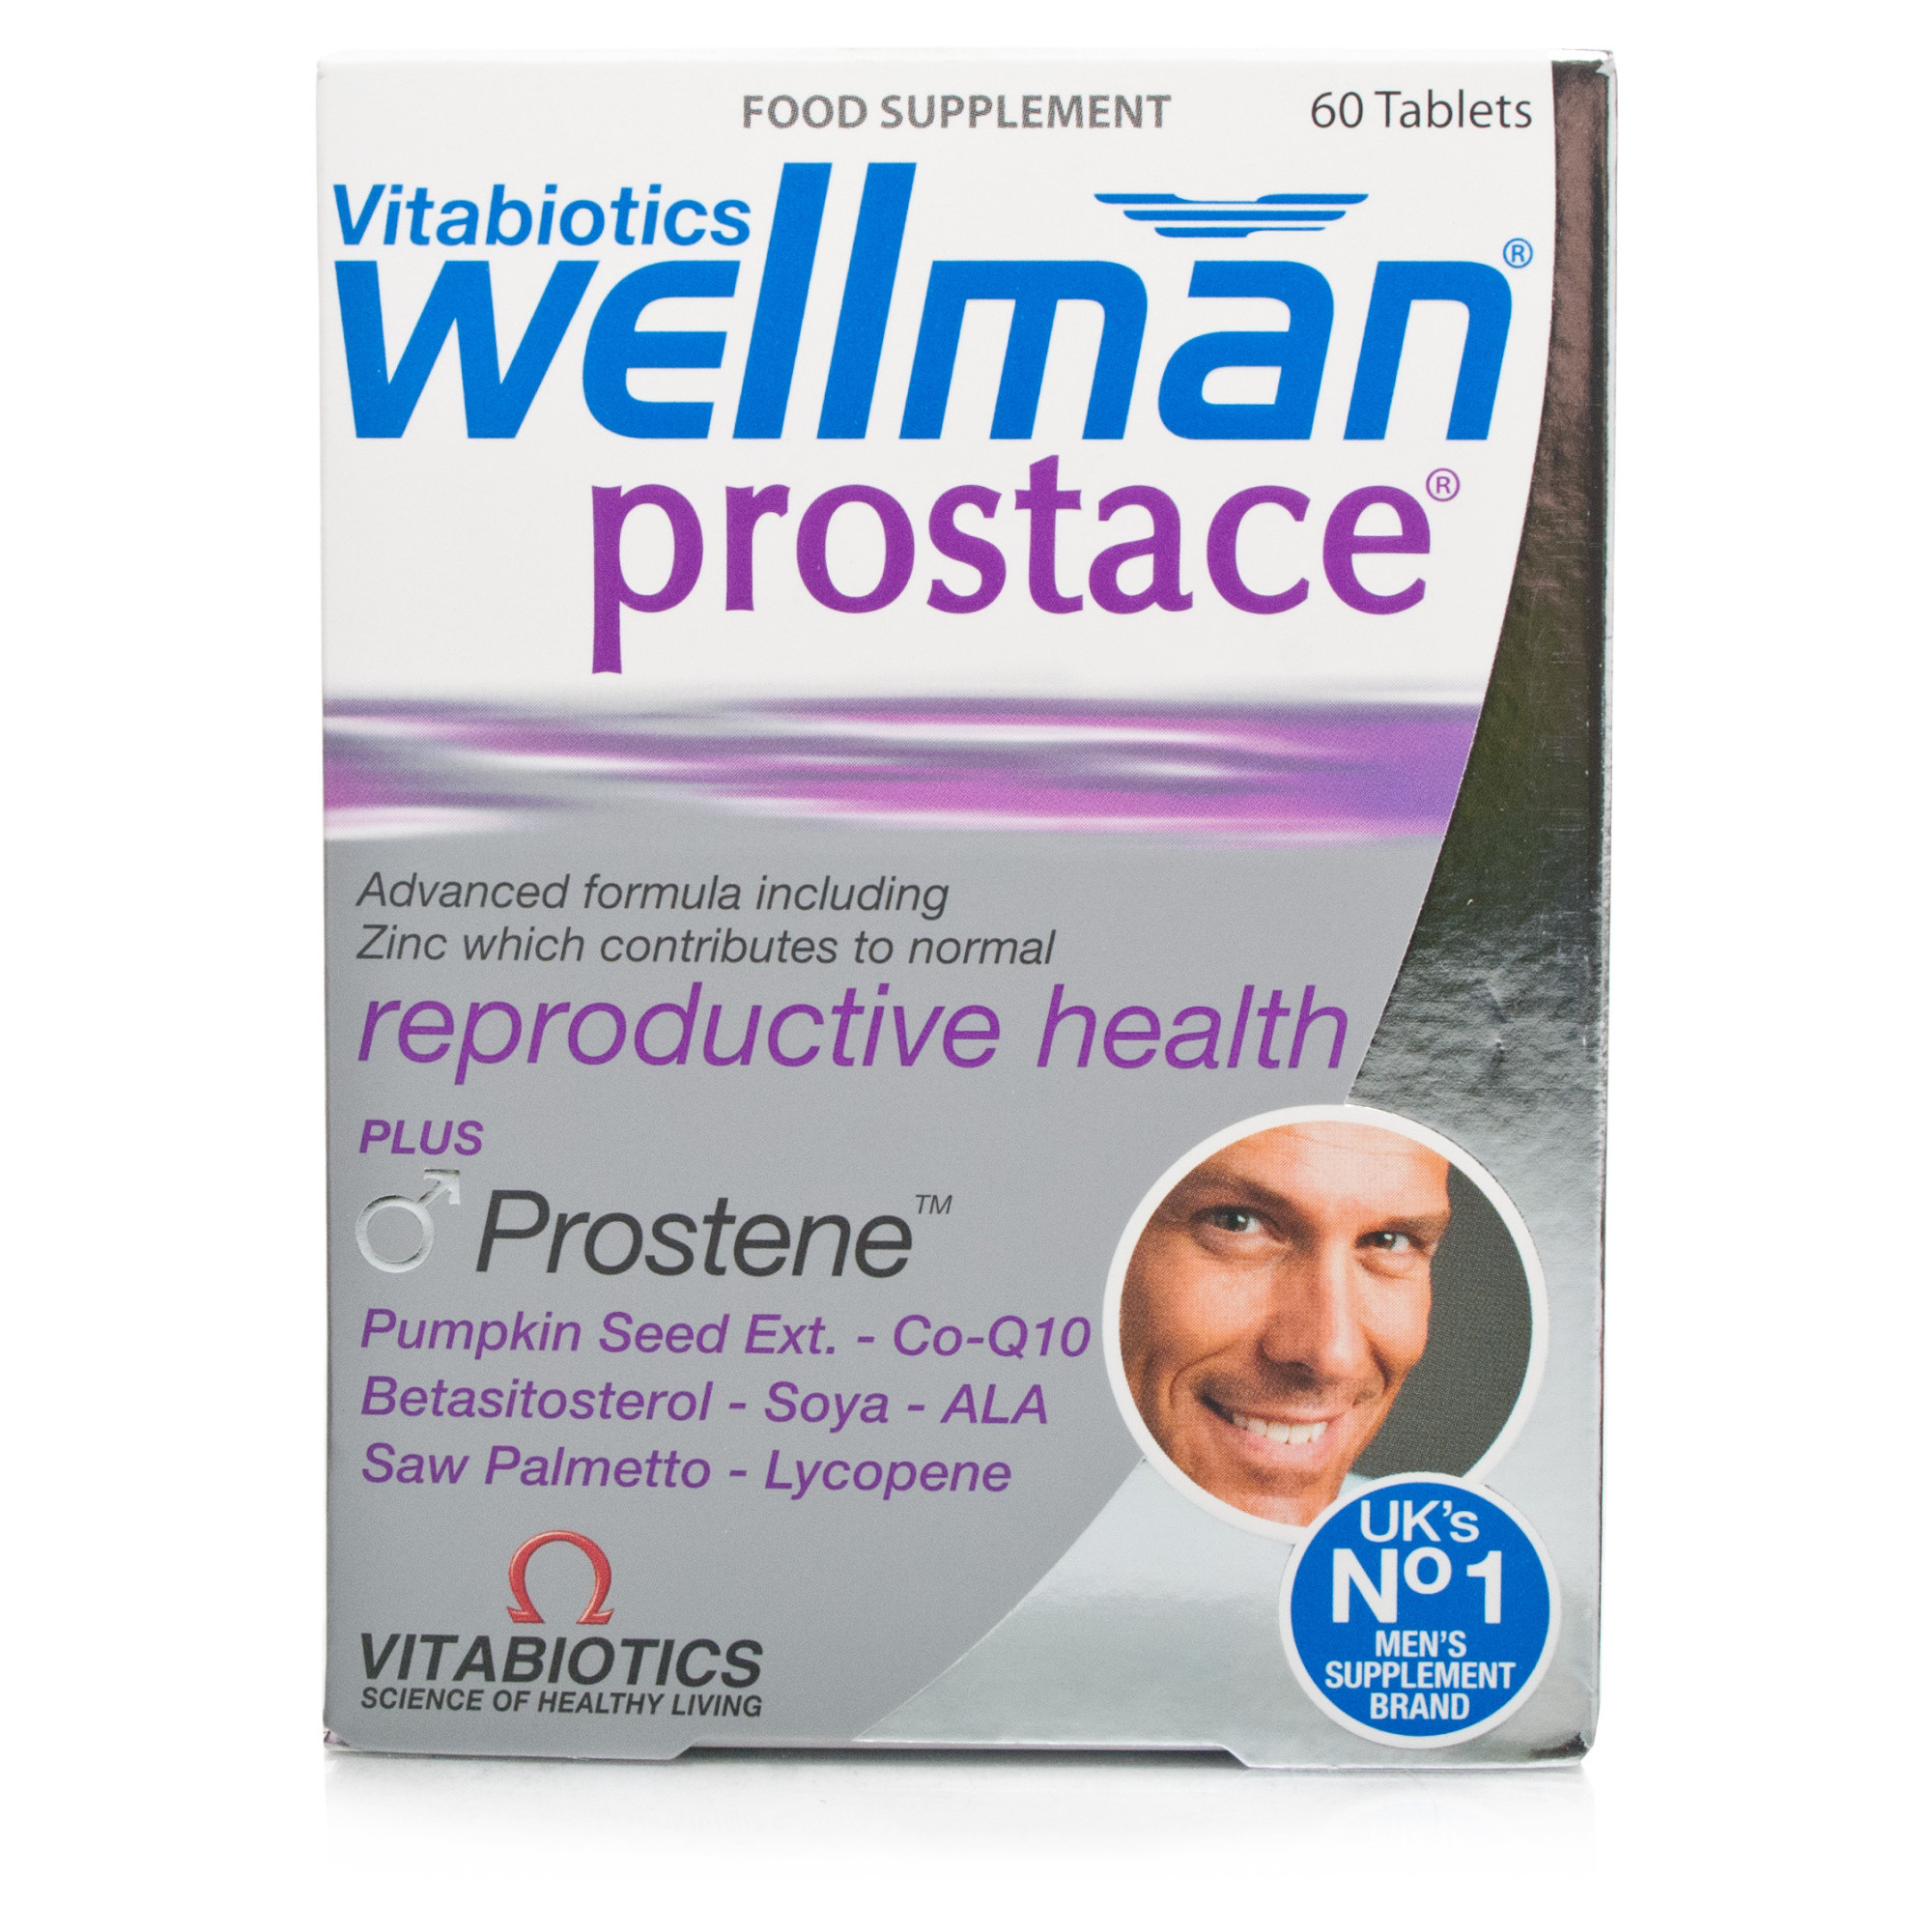 Vitabiotics Wellman Prostace